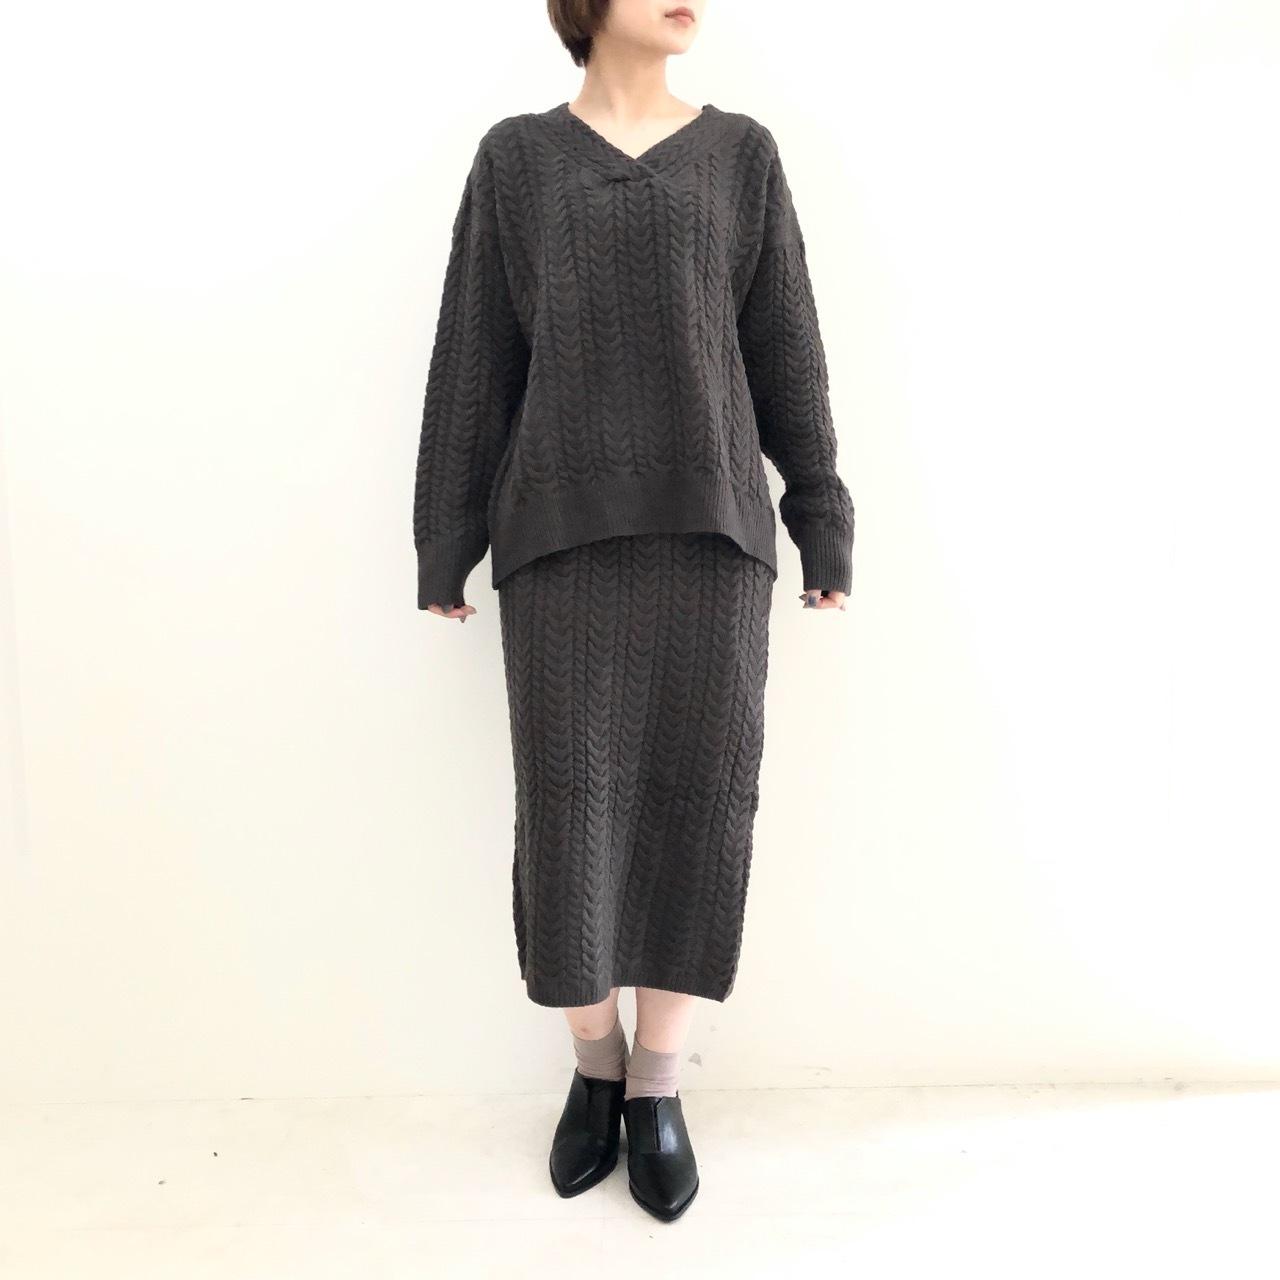 【 ROSIEE 】- 182713 - ケーブル編みセットアップ